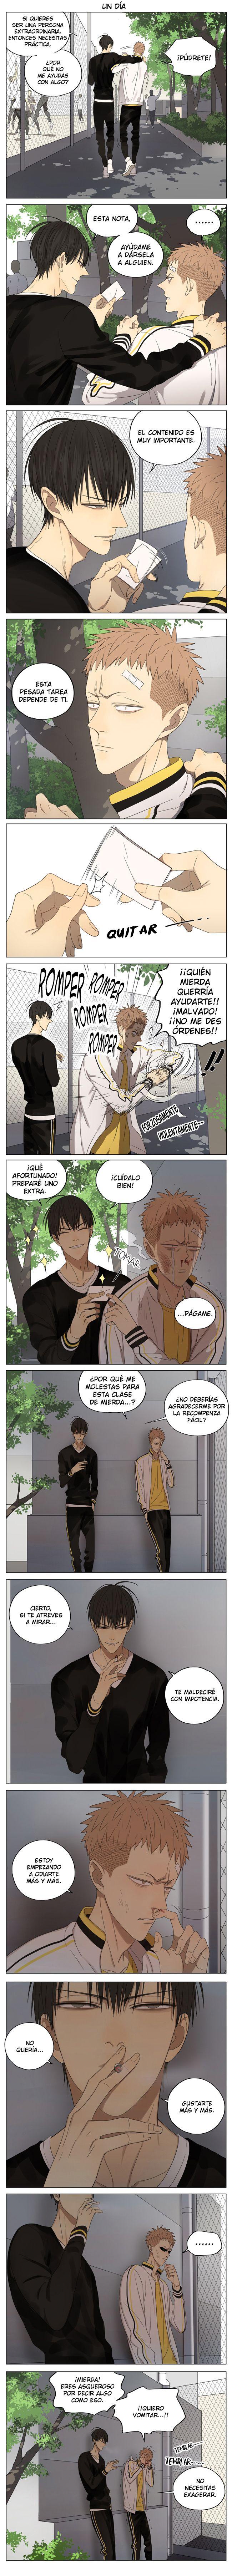 http://c5.ninemanga.com/es_manga/7/15943/454427/d79058bc2cc9eb428ee4f86439ab2070.jpg Page 2